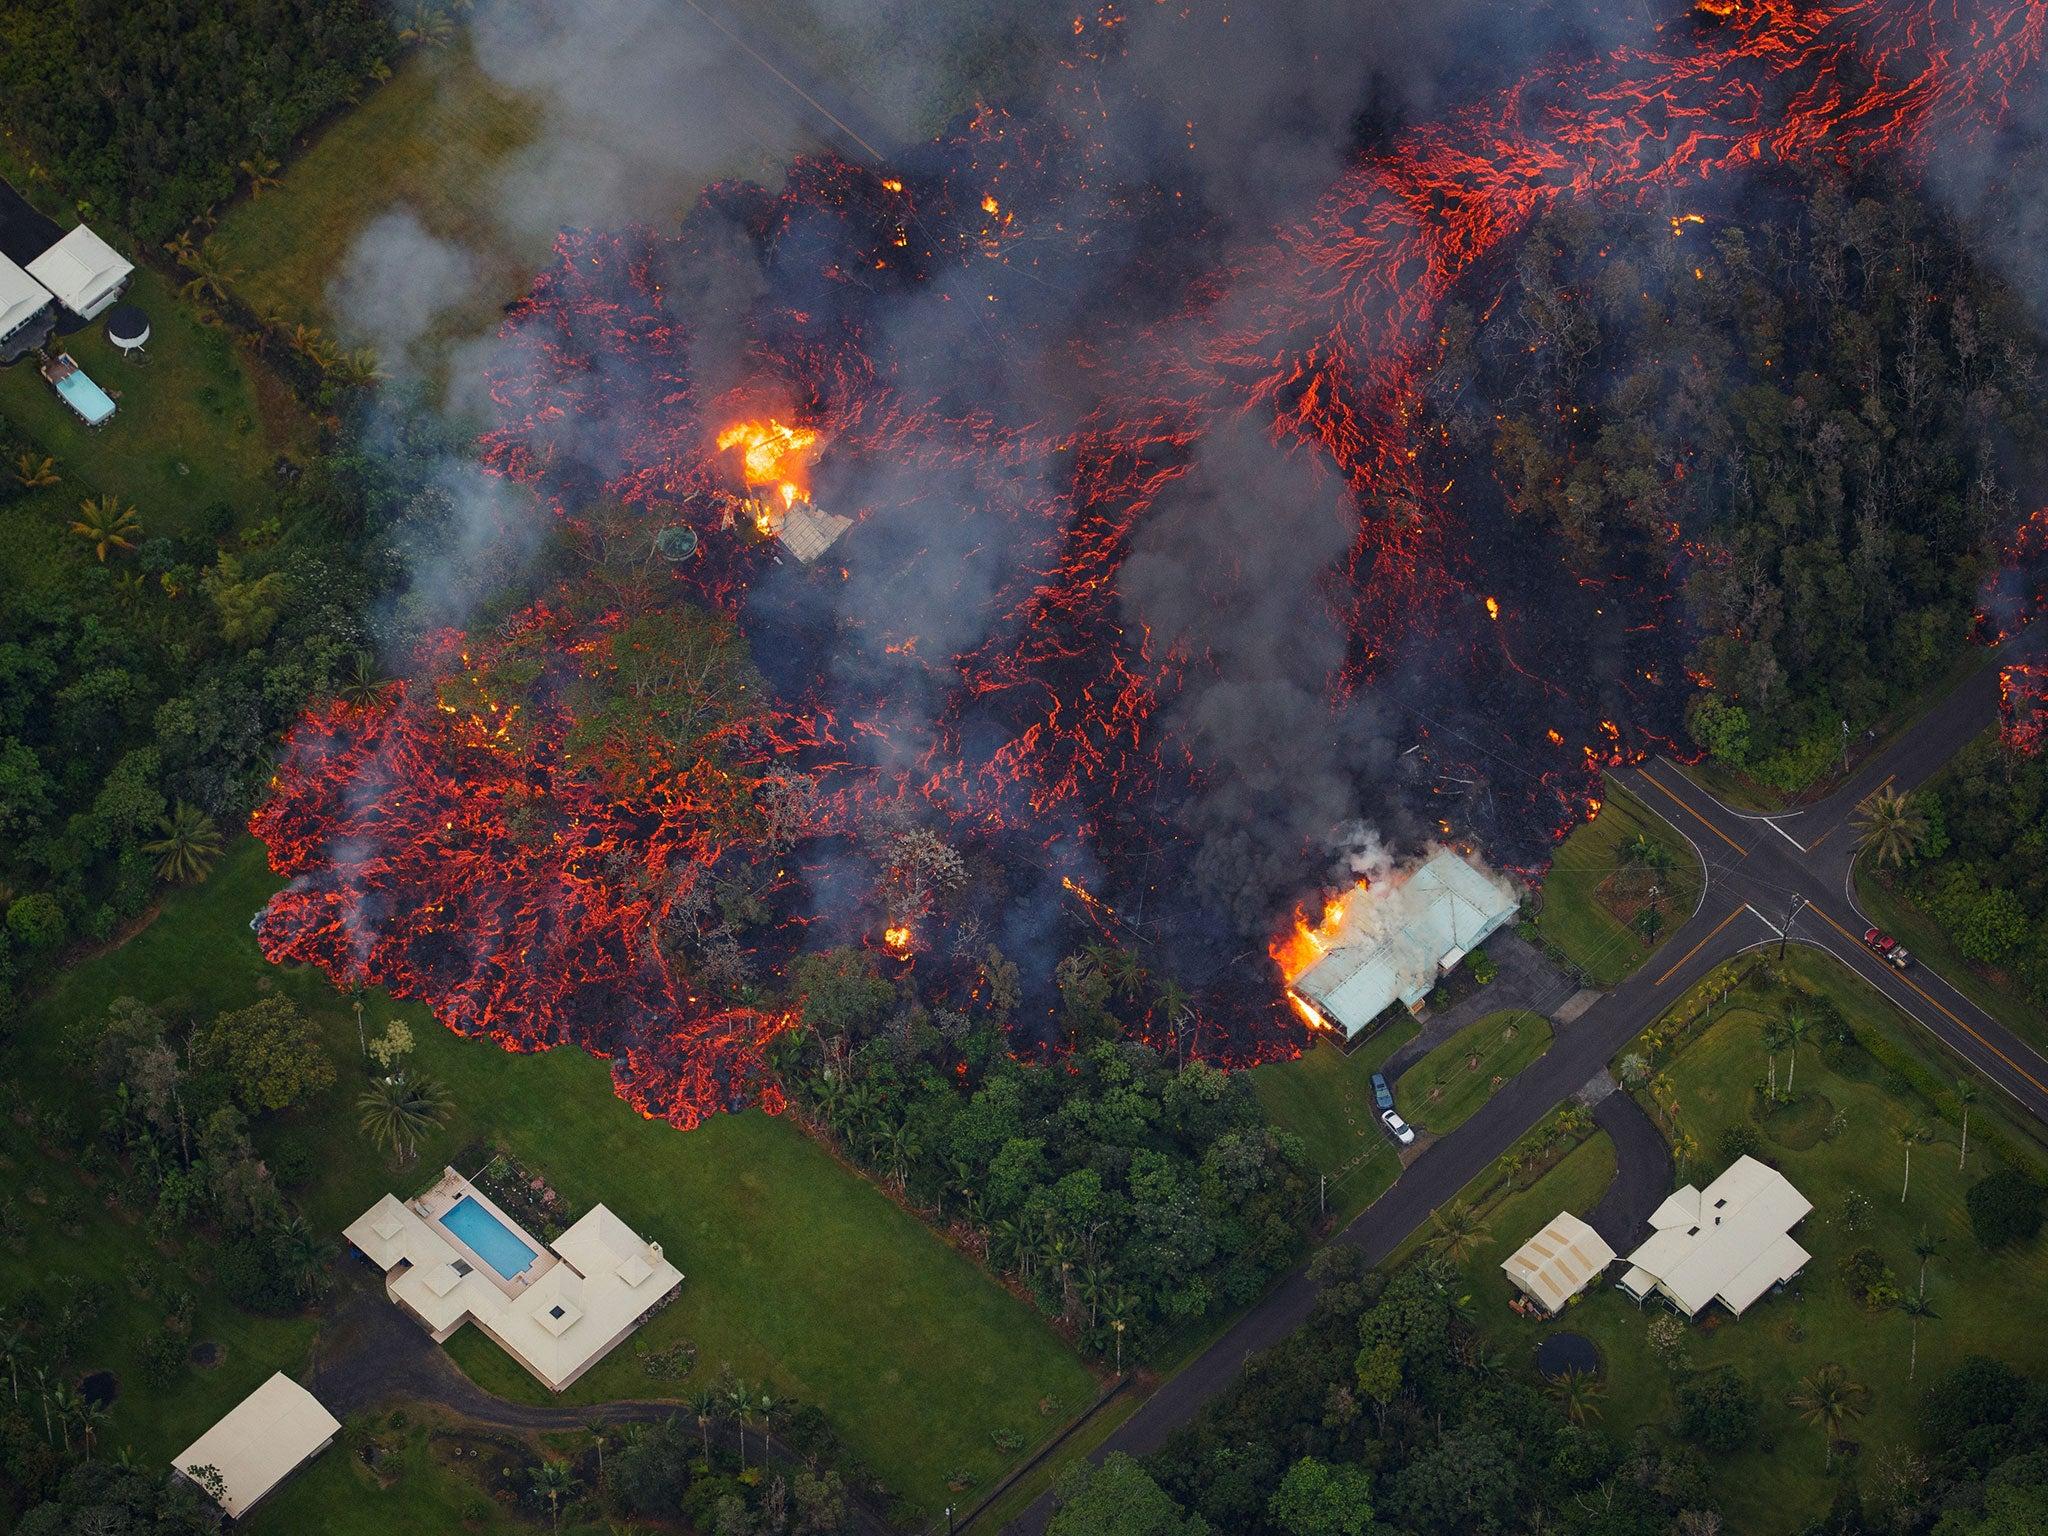 Mesmerising video shows Hawaii volcano lava lake spitting and bubbling